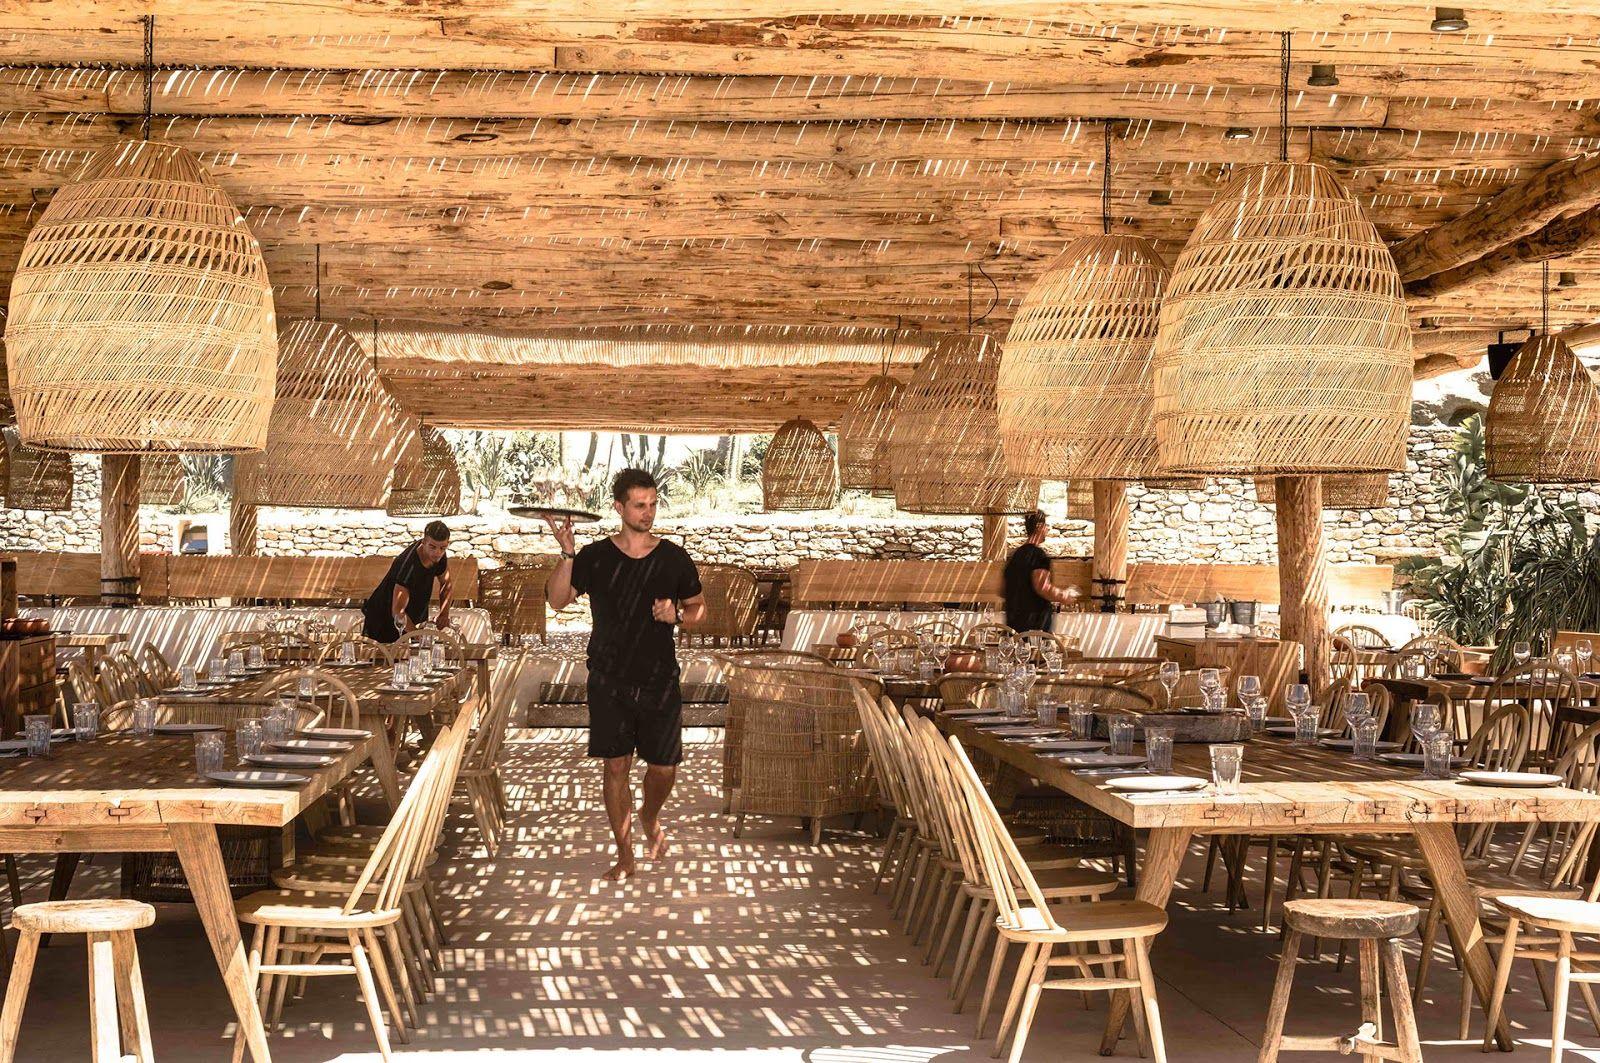 Le Scorpios A Mykonos Hotel Grece Restaurant Mykonos Exterieur Restaurant